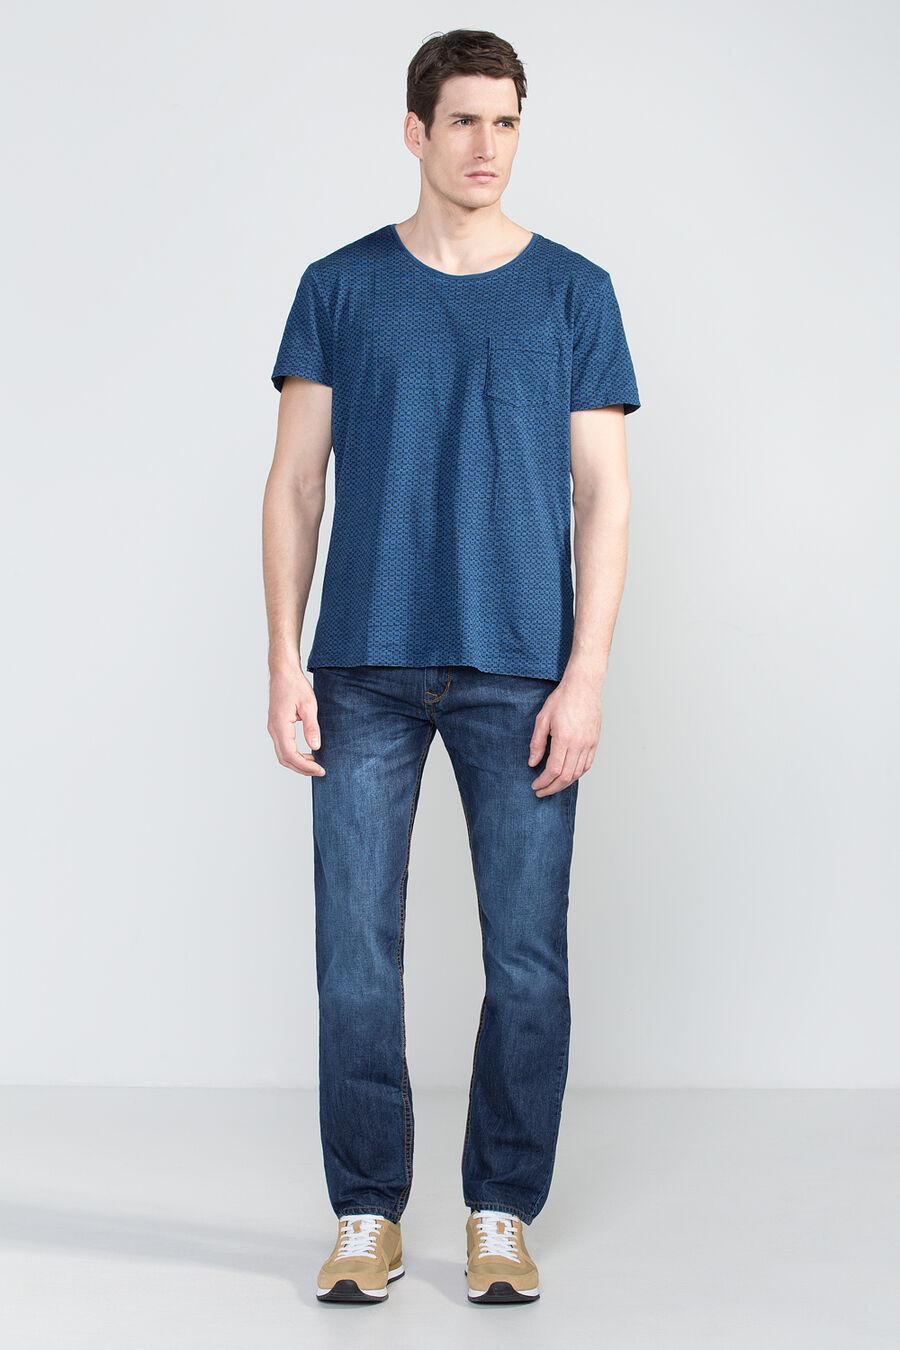 Indigo t-shirt